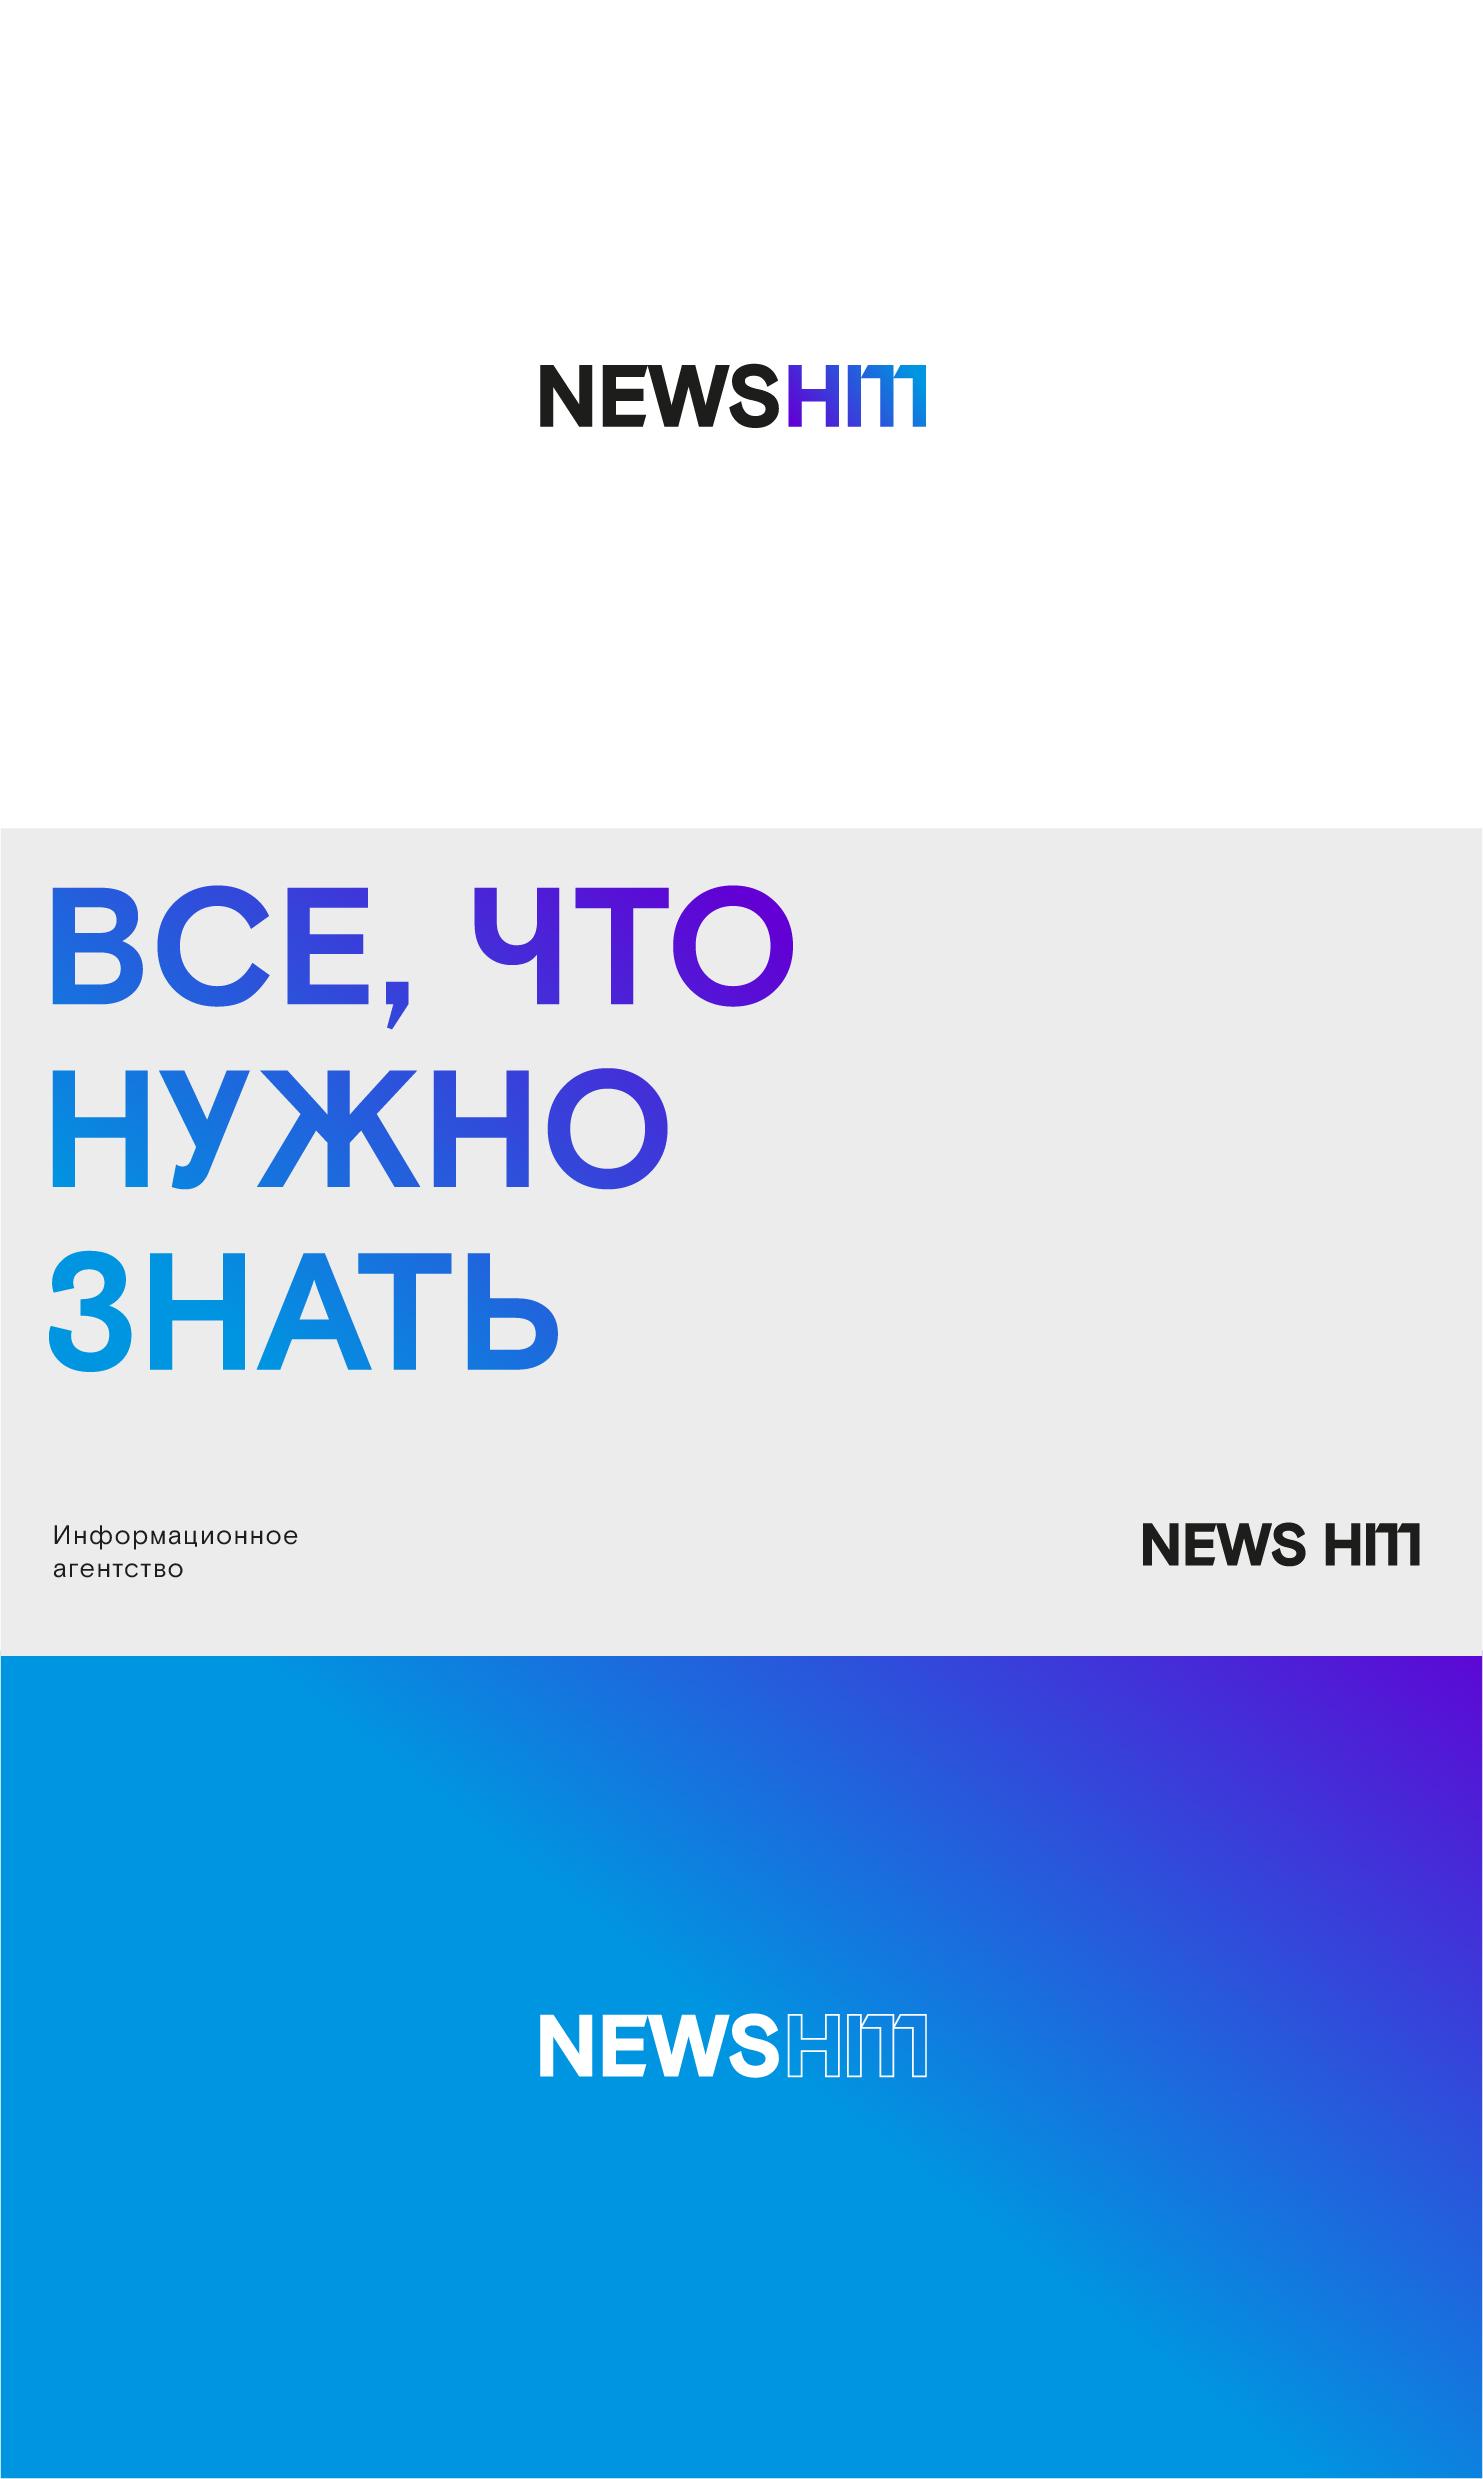 Логотип для информационного агентства фото f_7895aa53bd665da5.jpg